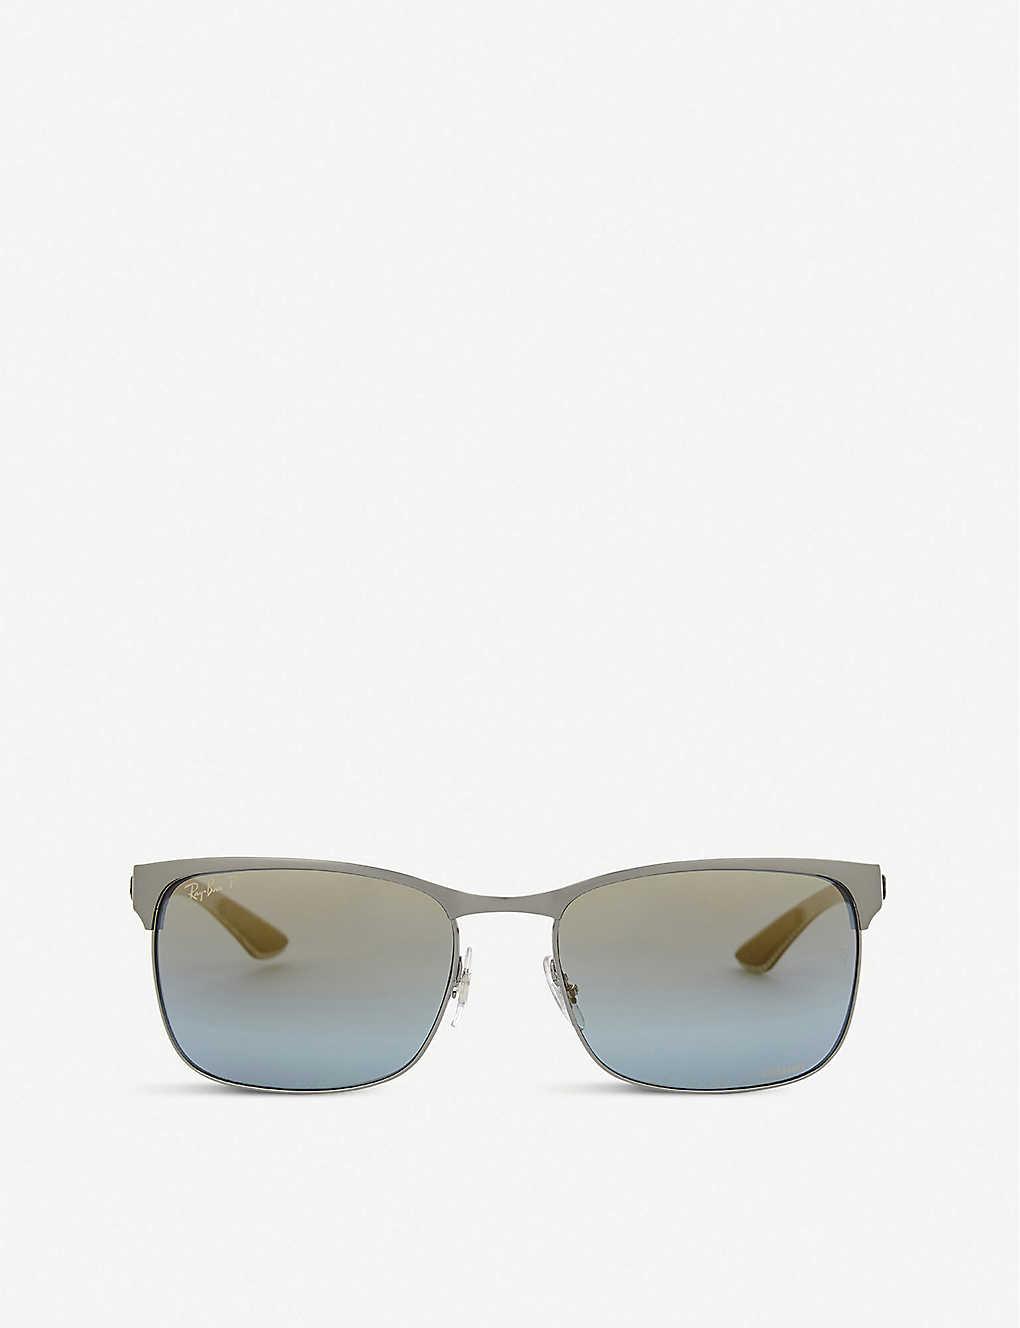 2fd4ab2c3b5 RAY-BAN - Rb8319 Chromance rectangle-frame sunglasses